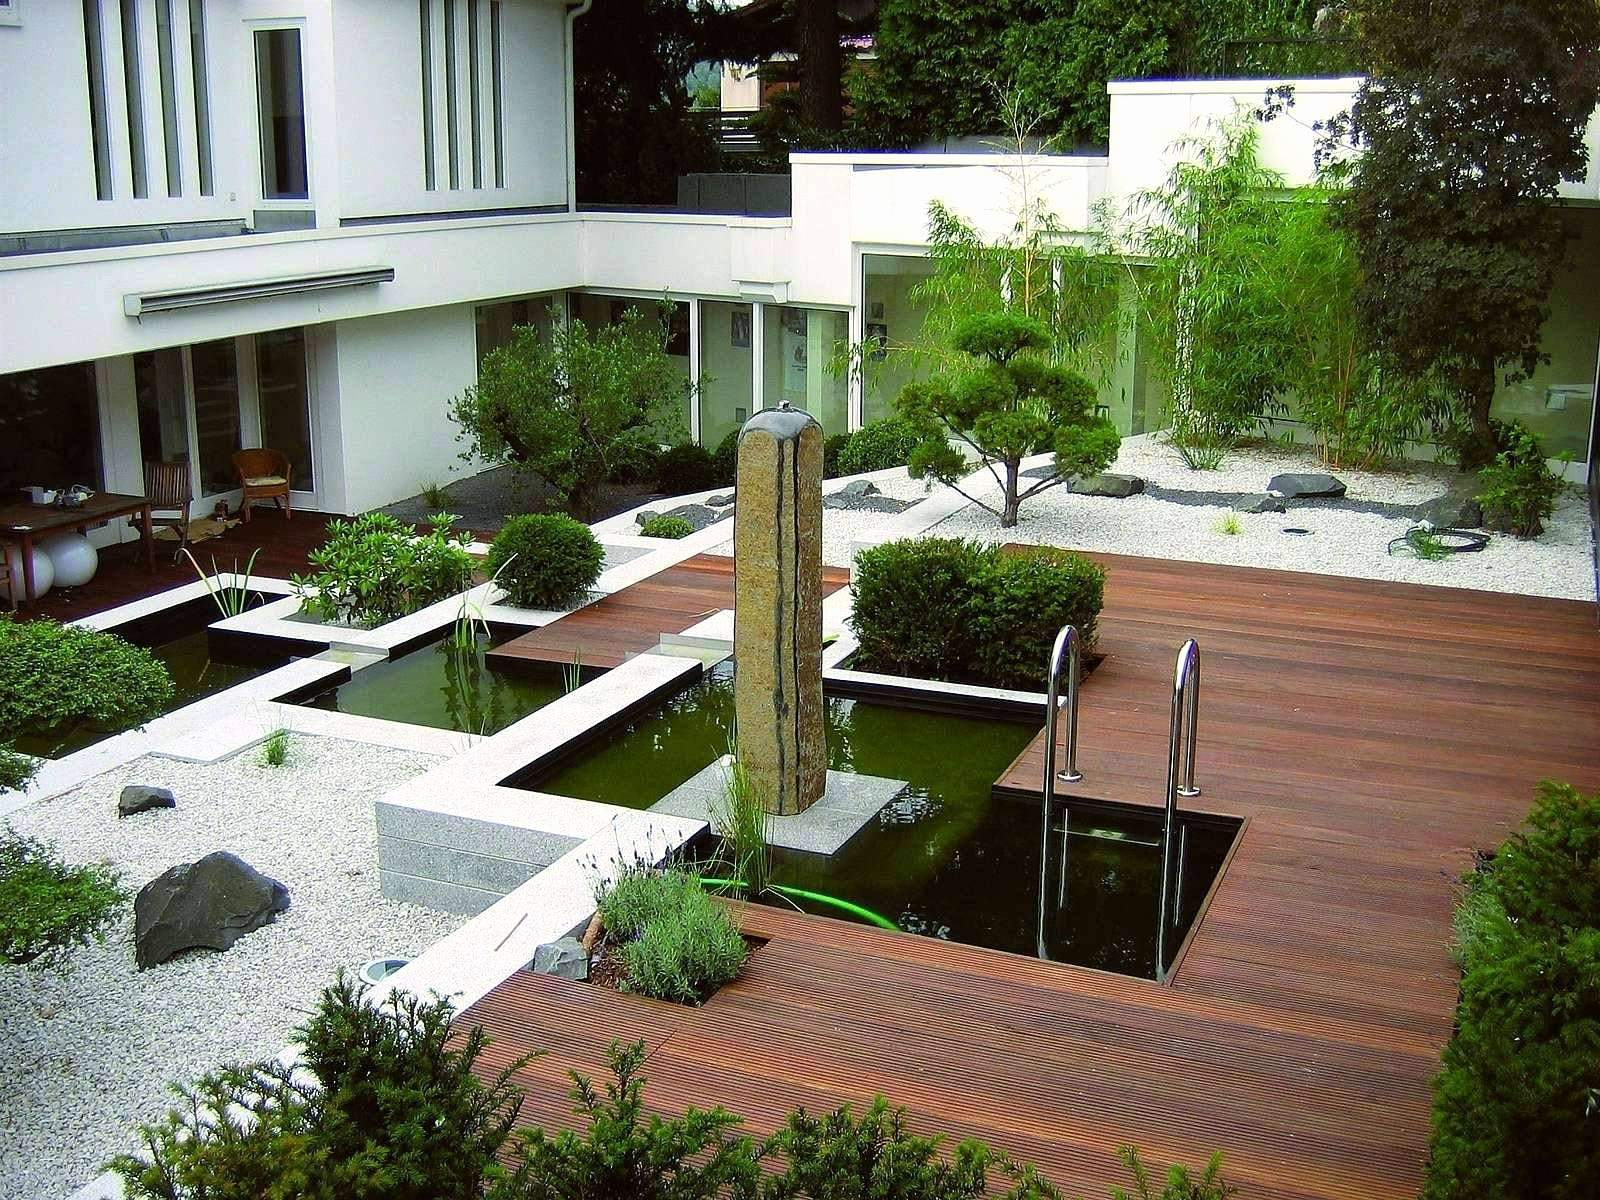 garten anlegen ideen das beste von terrasse anlegen ideen neu pool anlegen garten swimmingpool of garten anlegen ideen